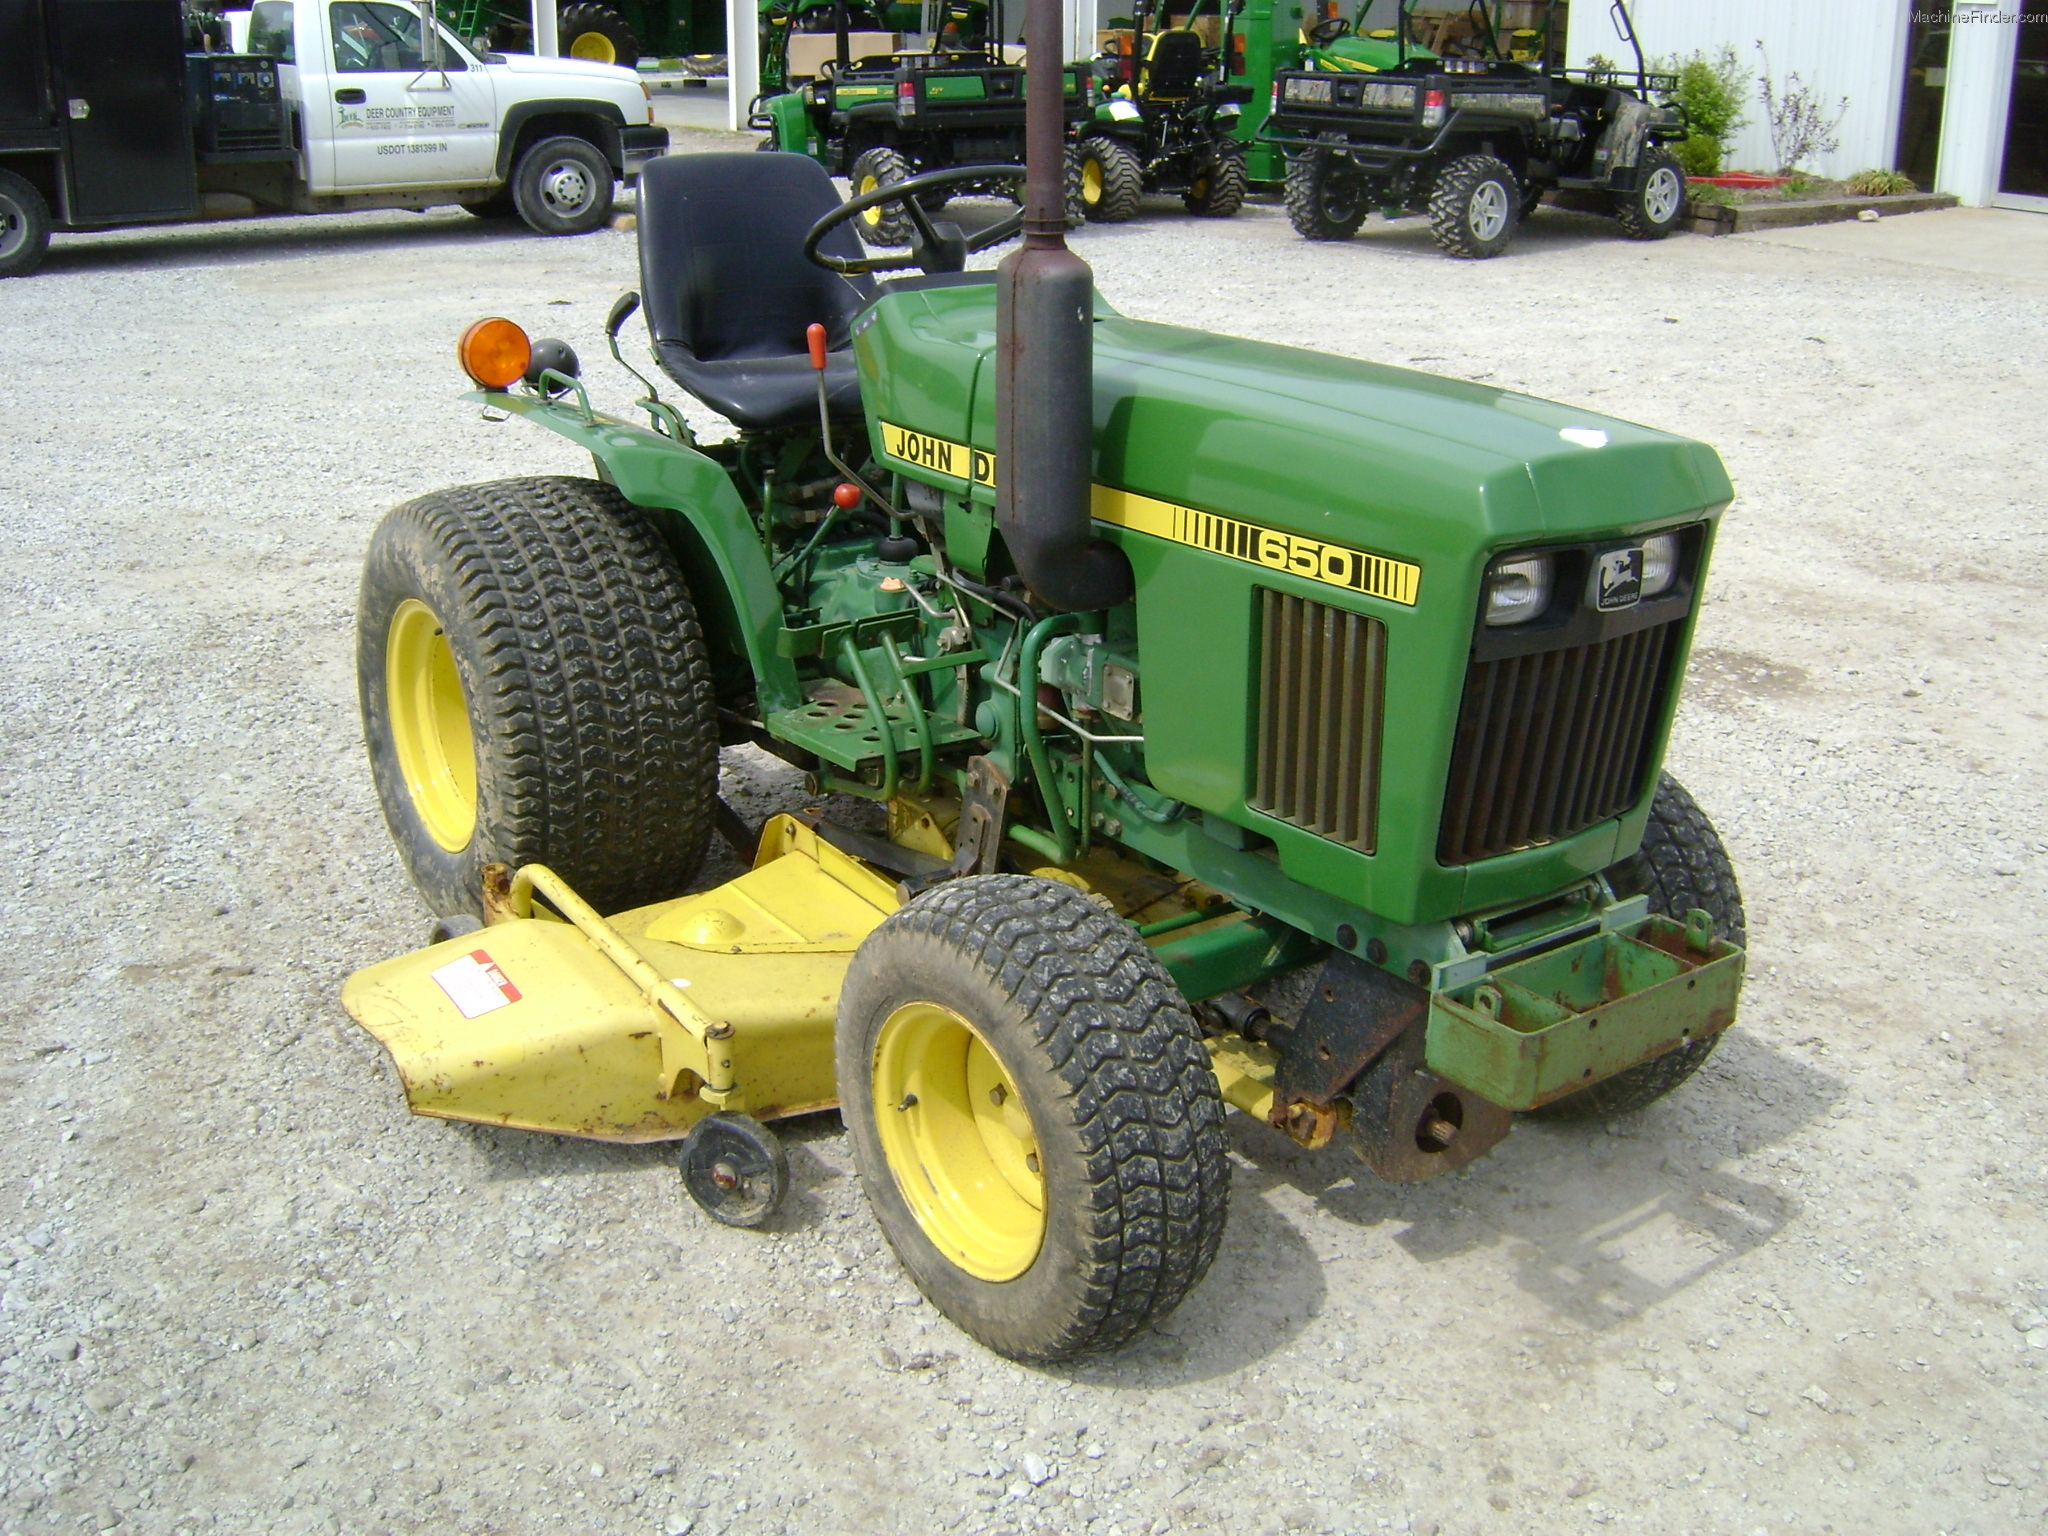 1983 John Deere 650 Tractors - Compact (1-40hp.) - John ...